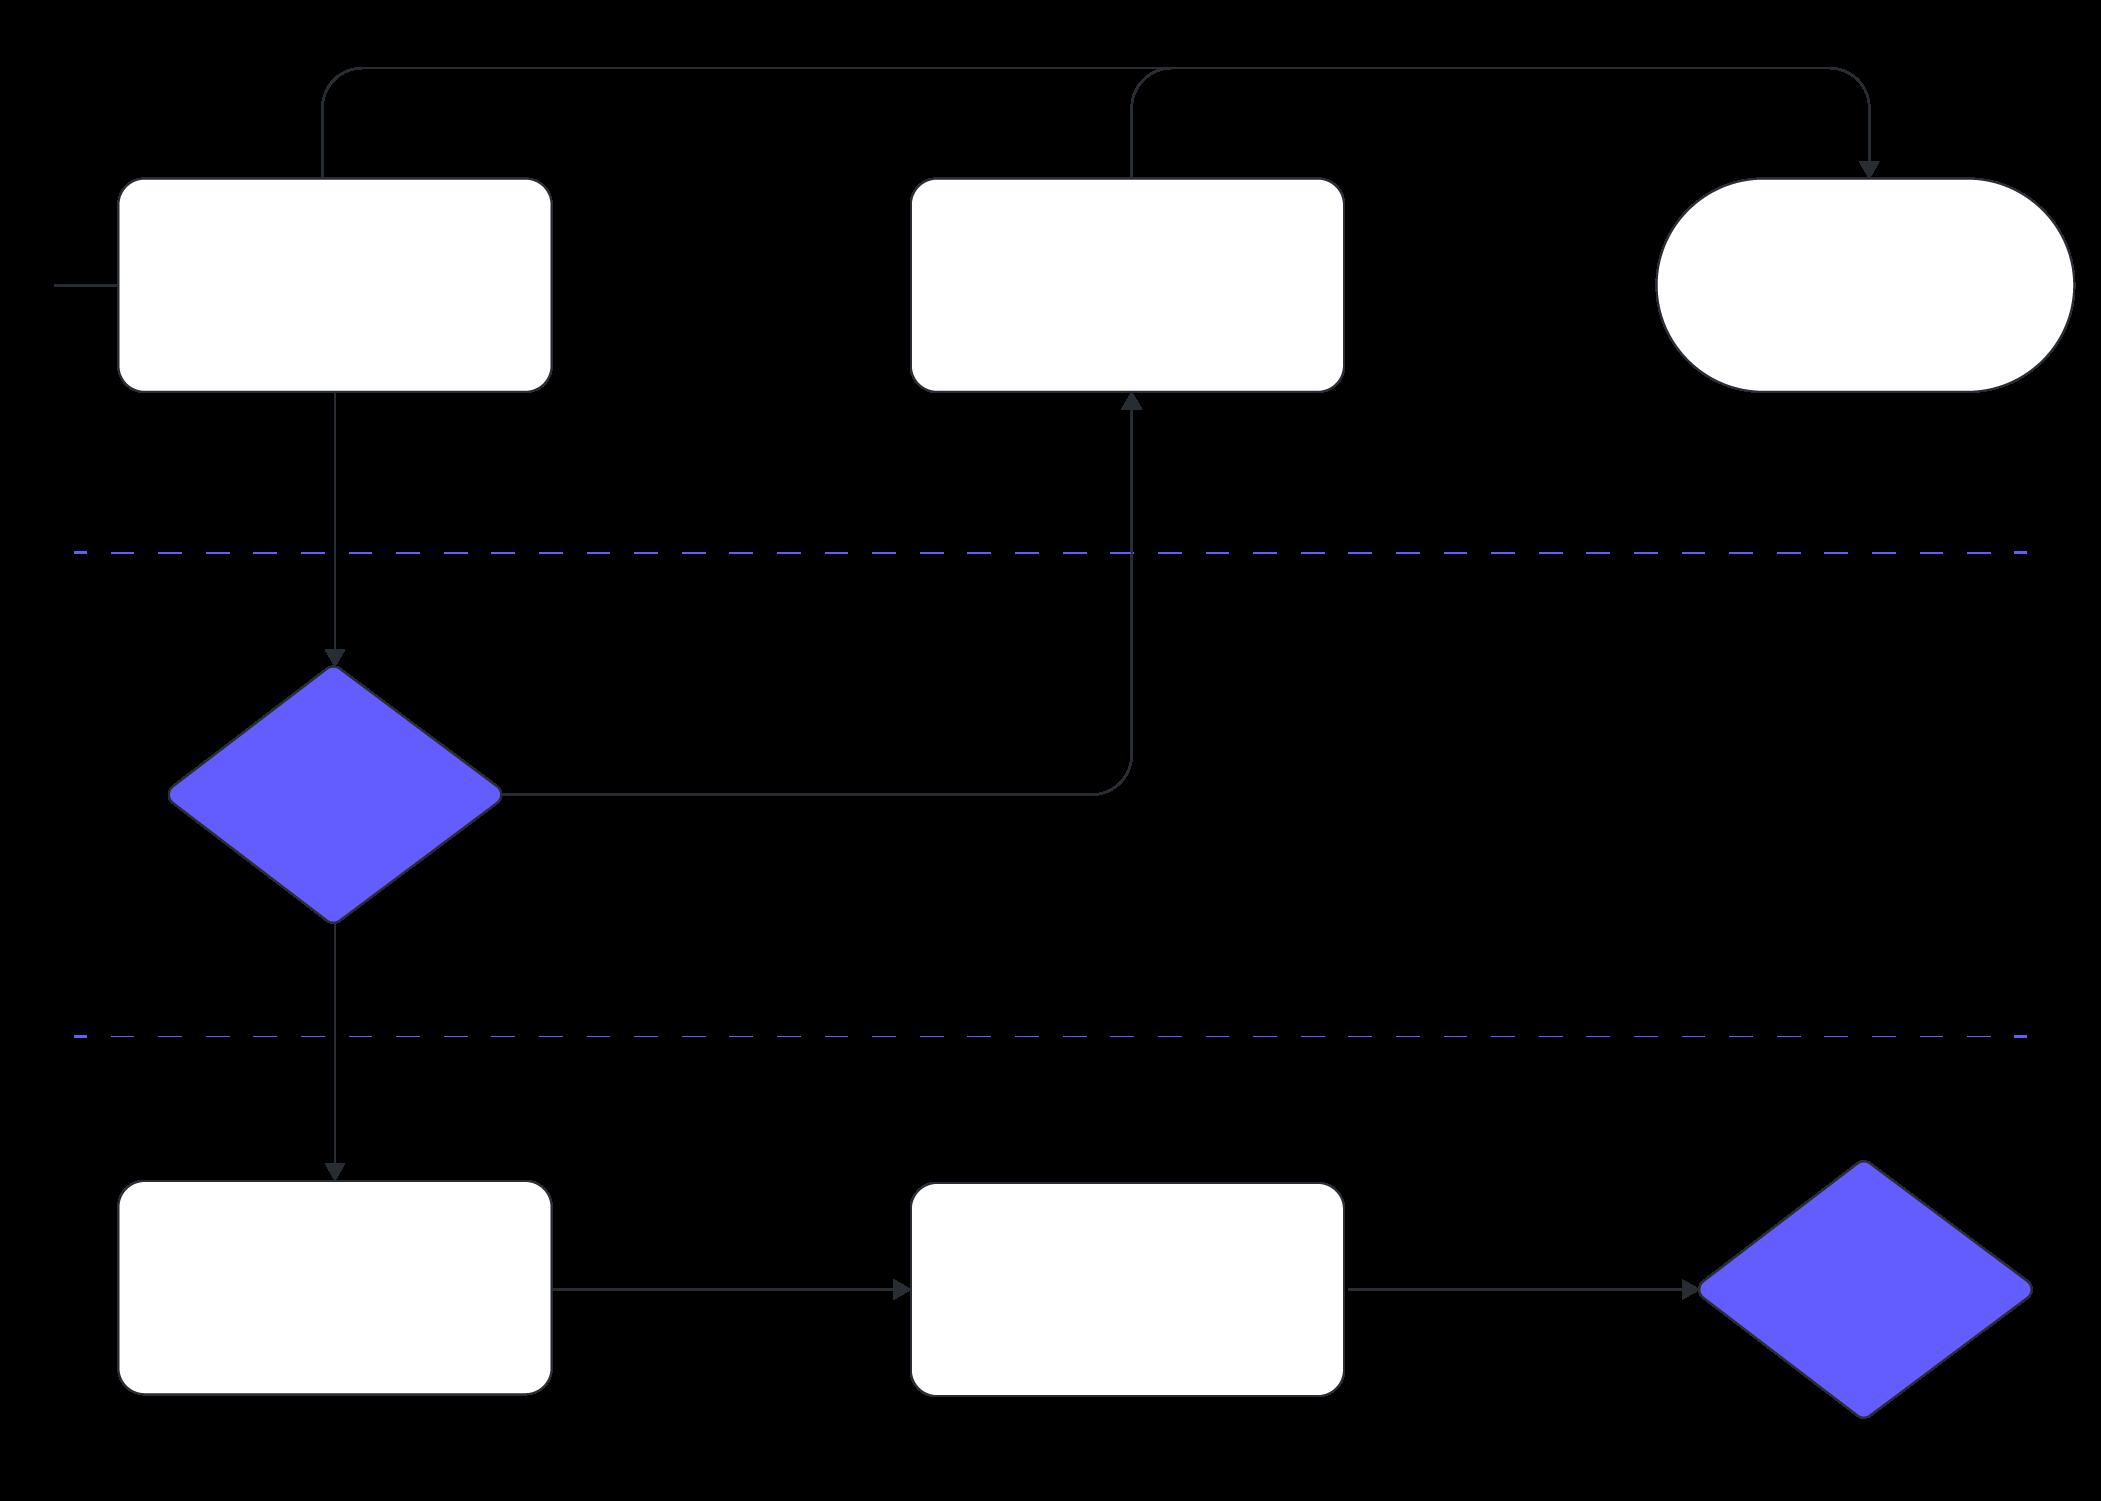 diagramme fast en ligne